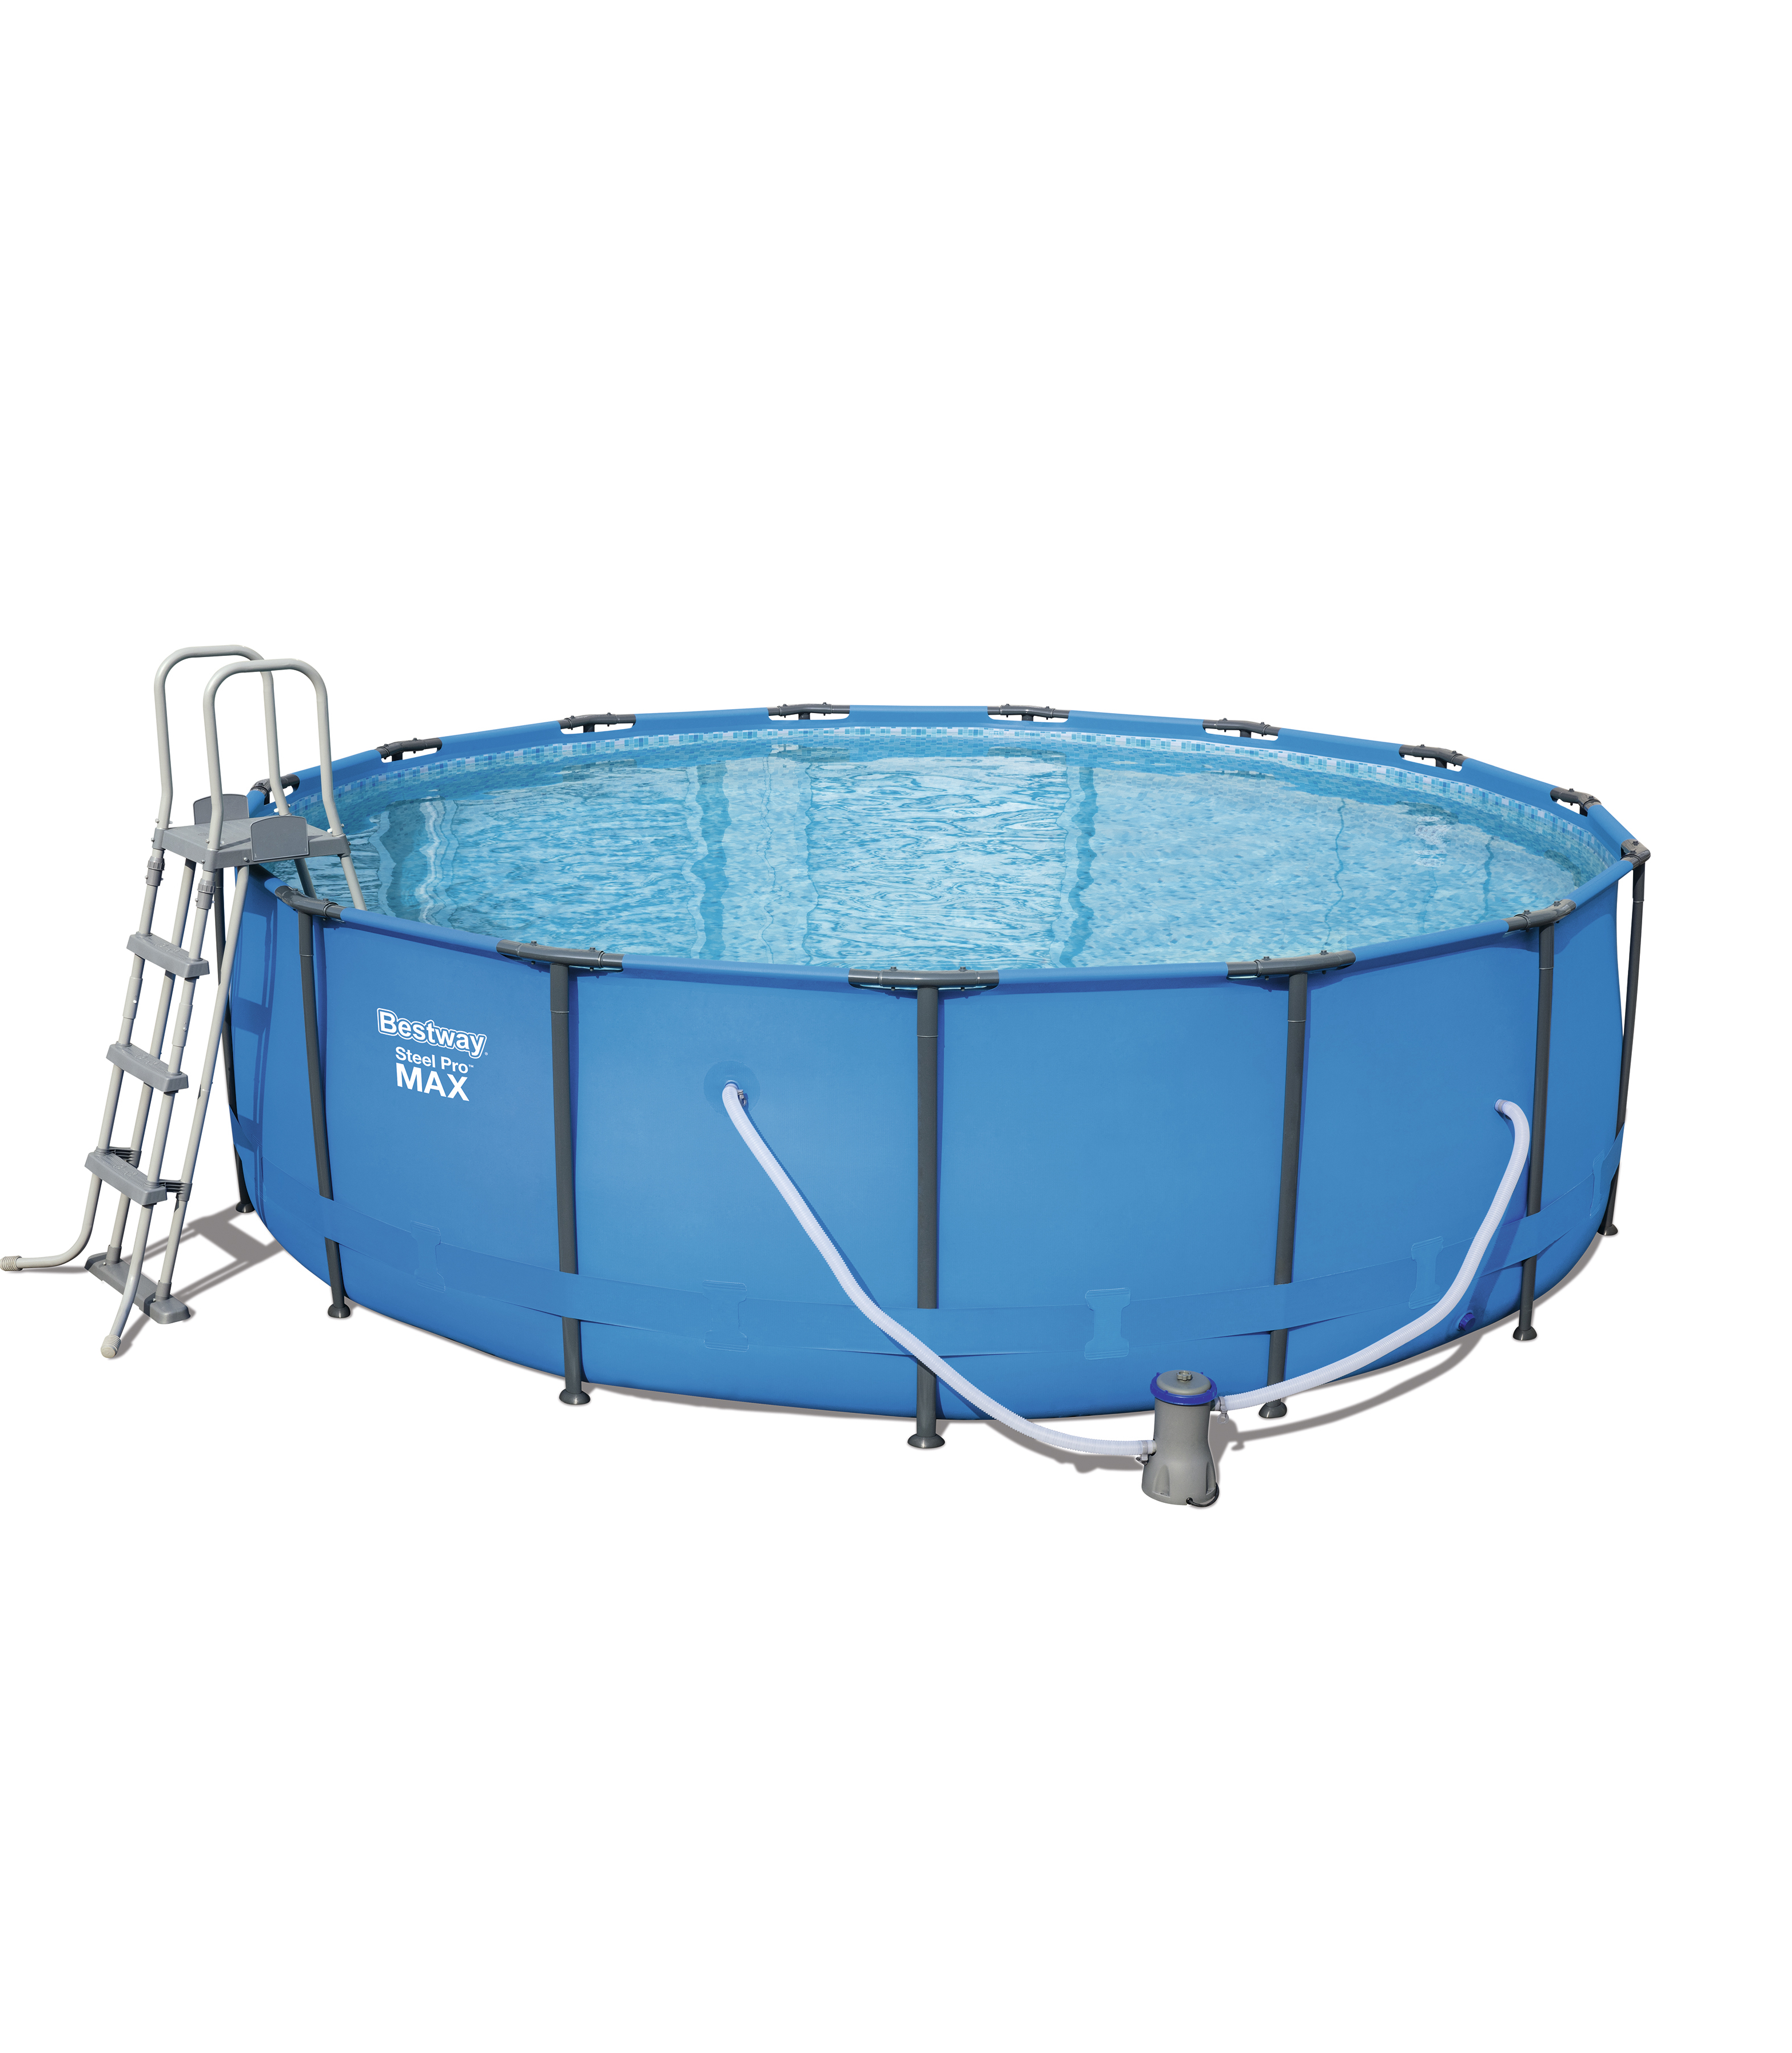 Scaffold Round Basin 457 х122 Cm, 16015 L, Bestway, Blue, Item No. 56438/56100